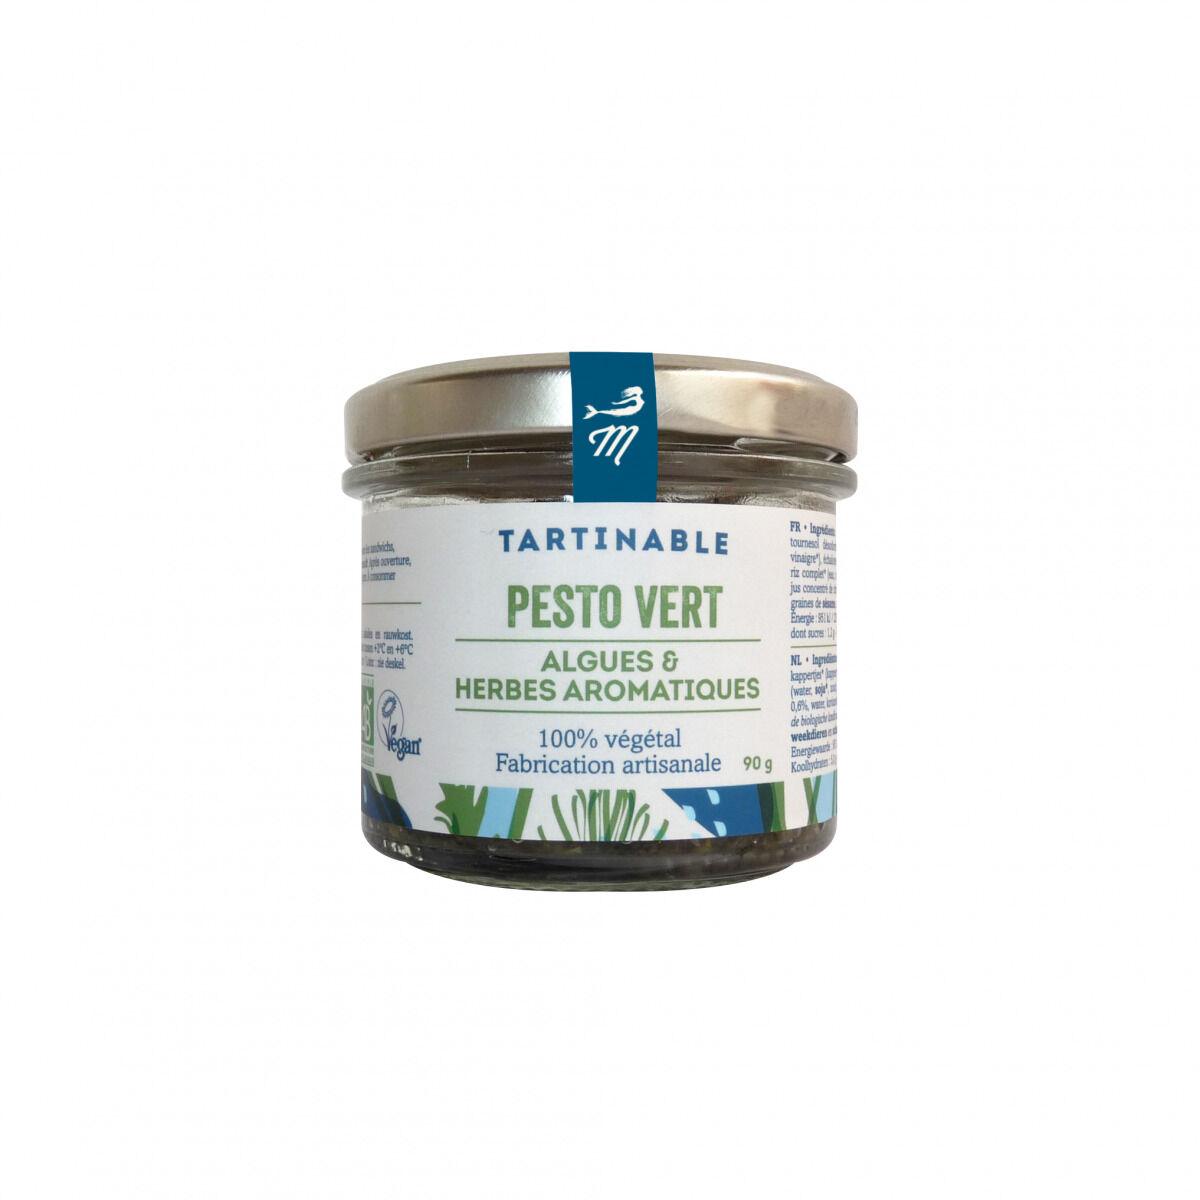 Marinoë Tartinable Pesto Vert : Algues & Herbes aromatiques